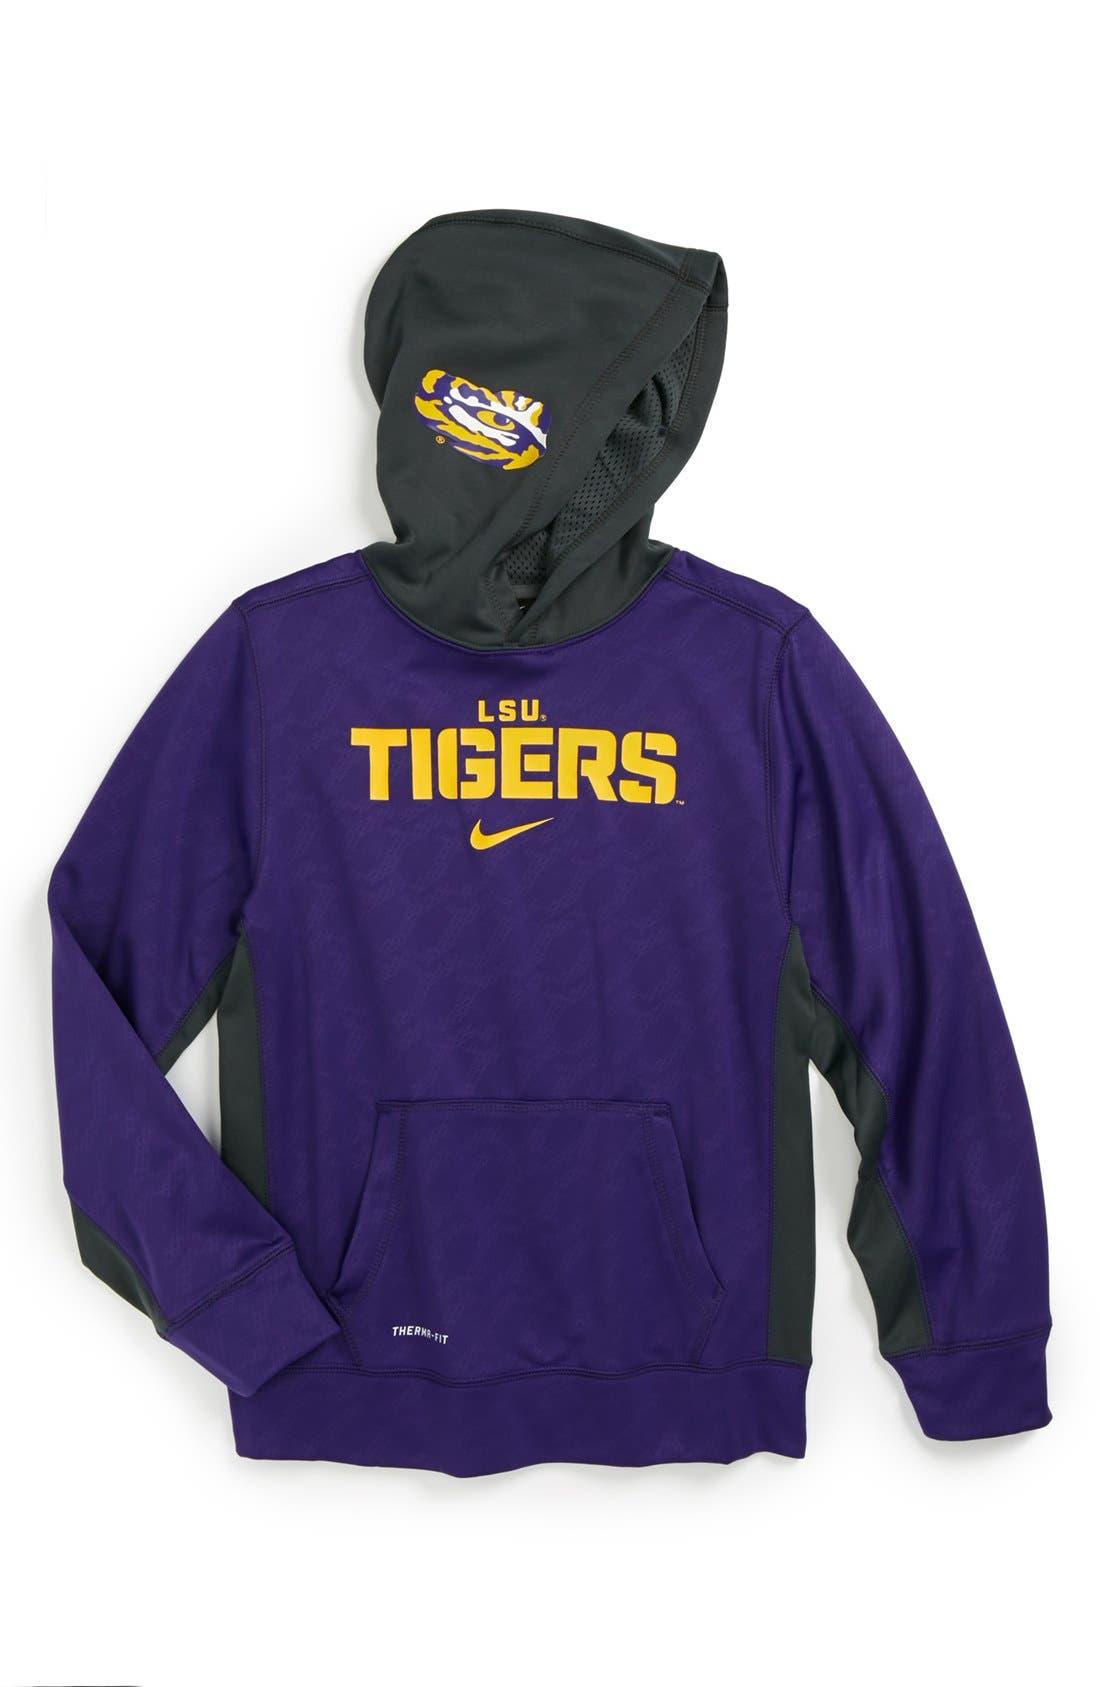 Main Image - Nike 'LSU Tigers' Therma-FIT Pullover Hoodie (Big Boys)